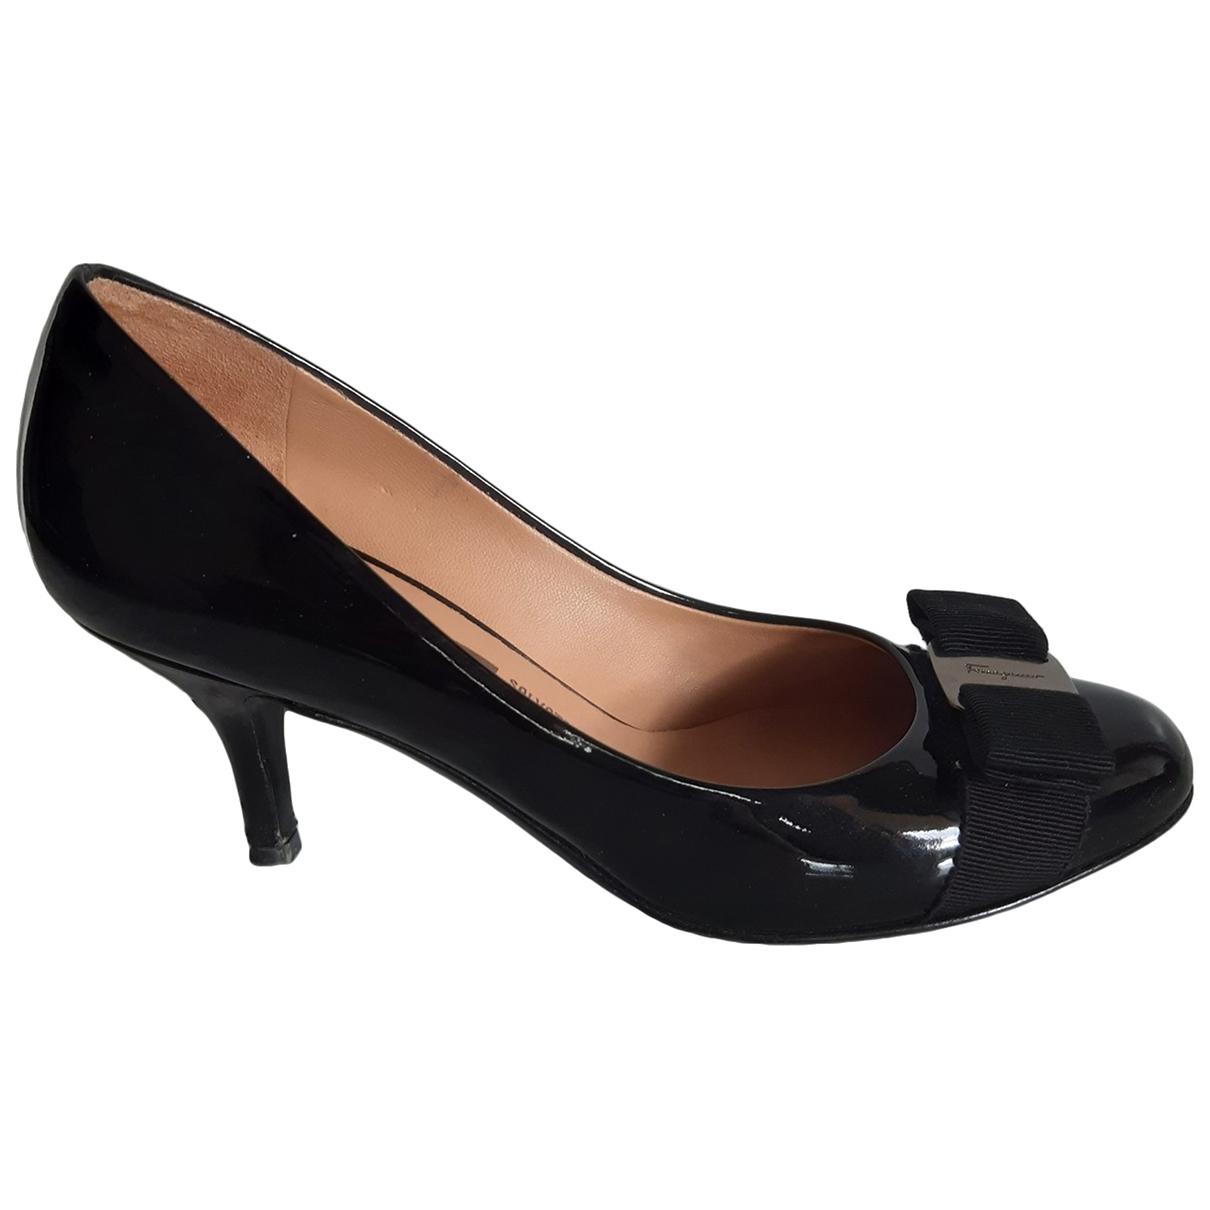 Salvatore Ferragamo \N Black Patent leather Heels for Women 6 US